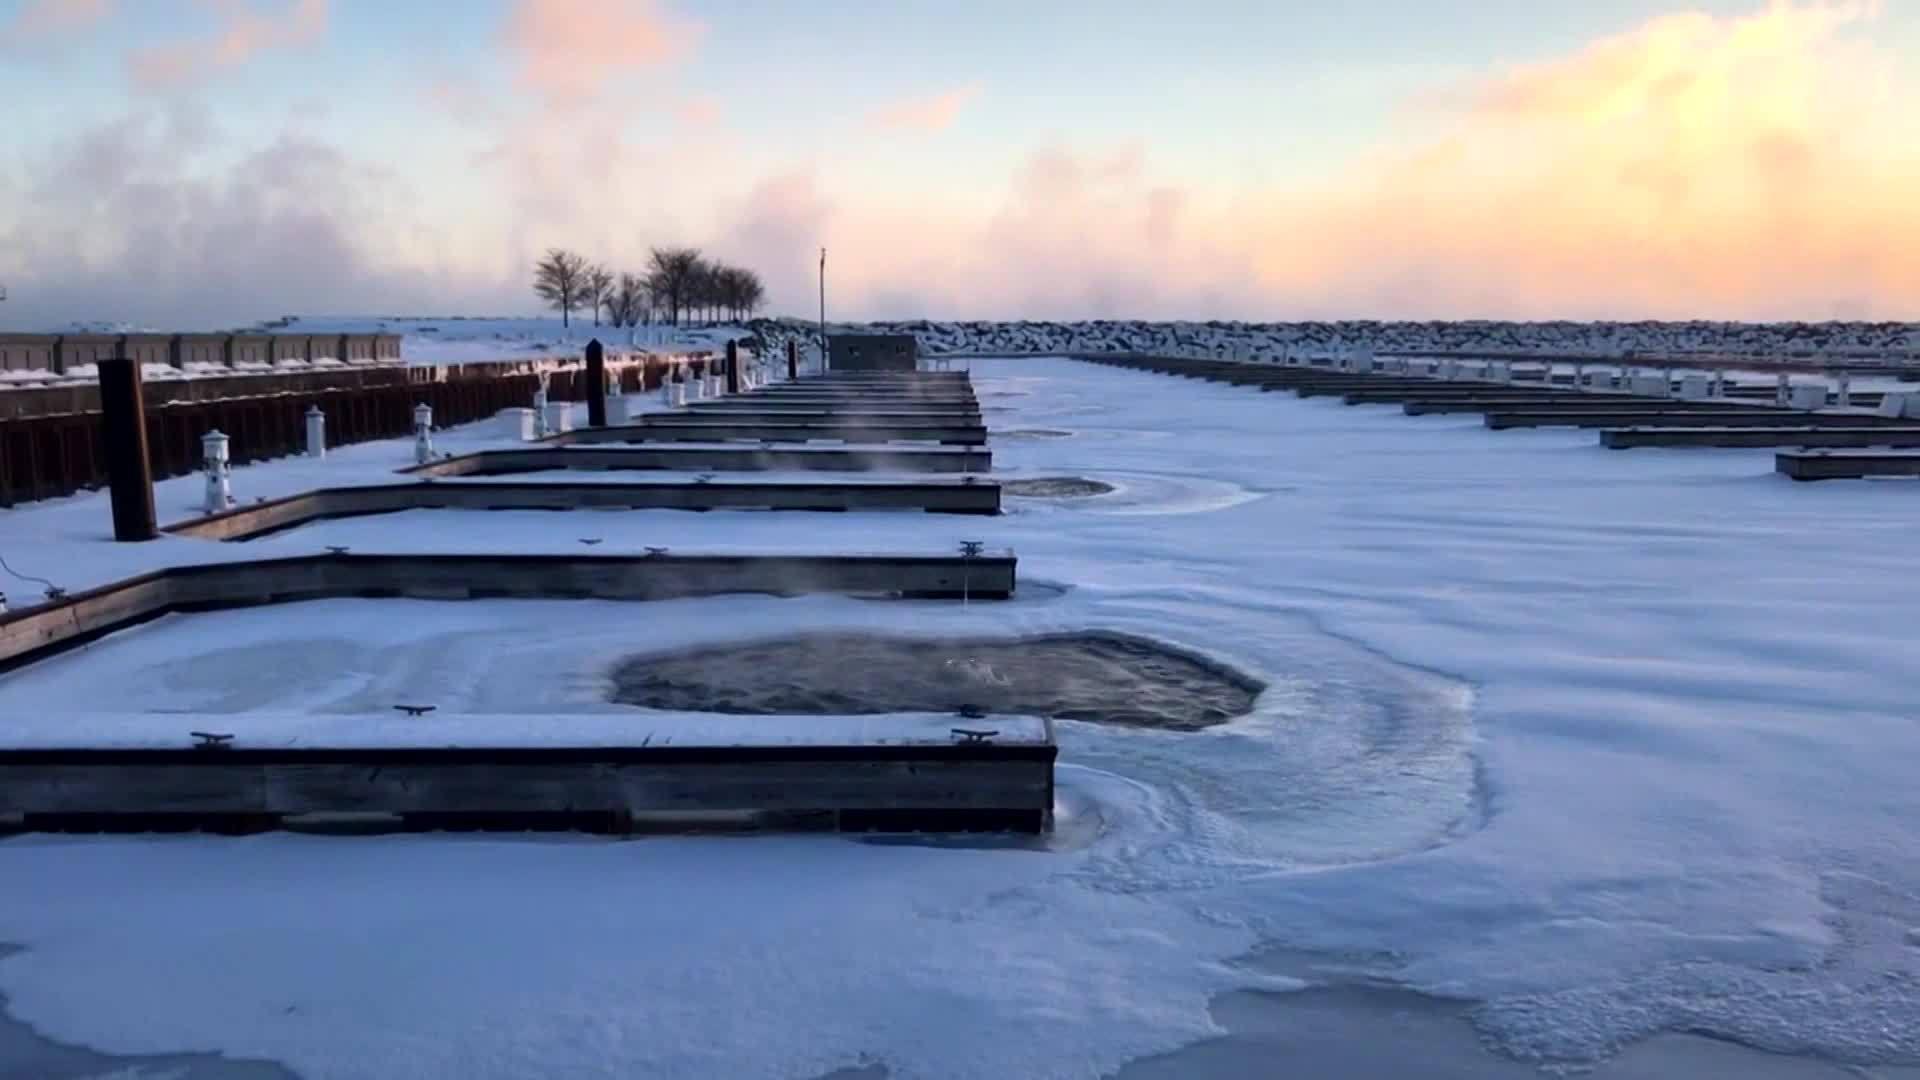 WATCH: Sights from frigid Chicago